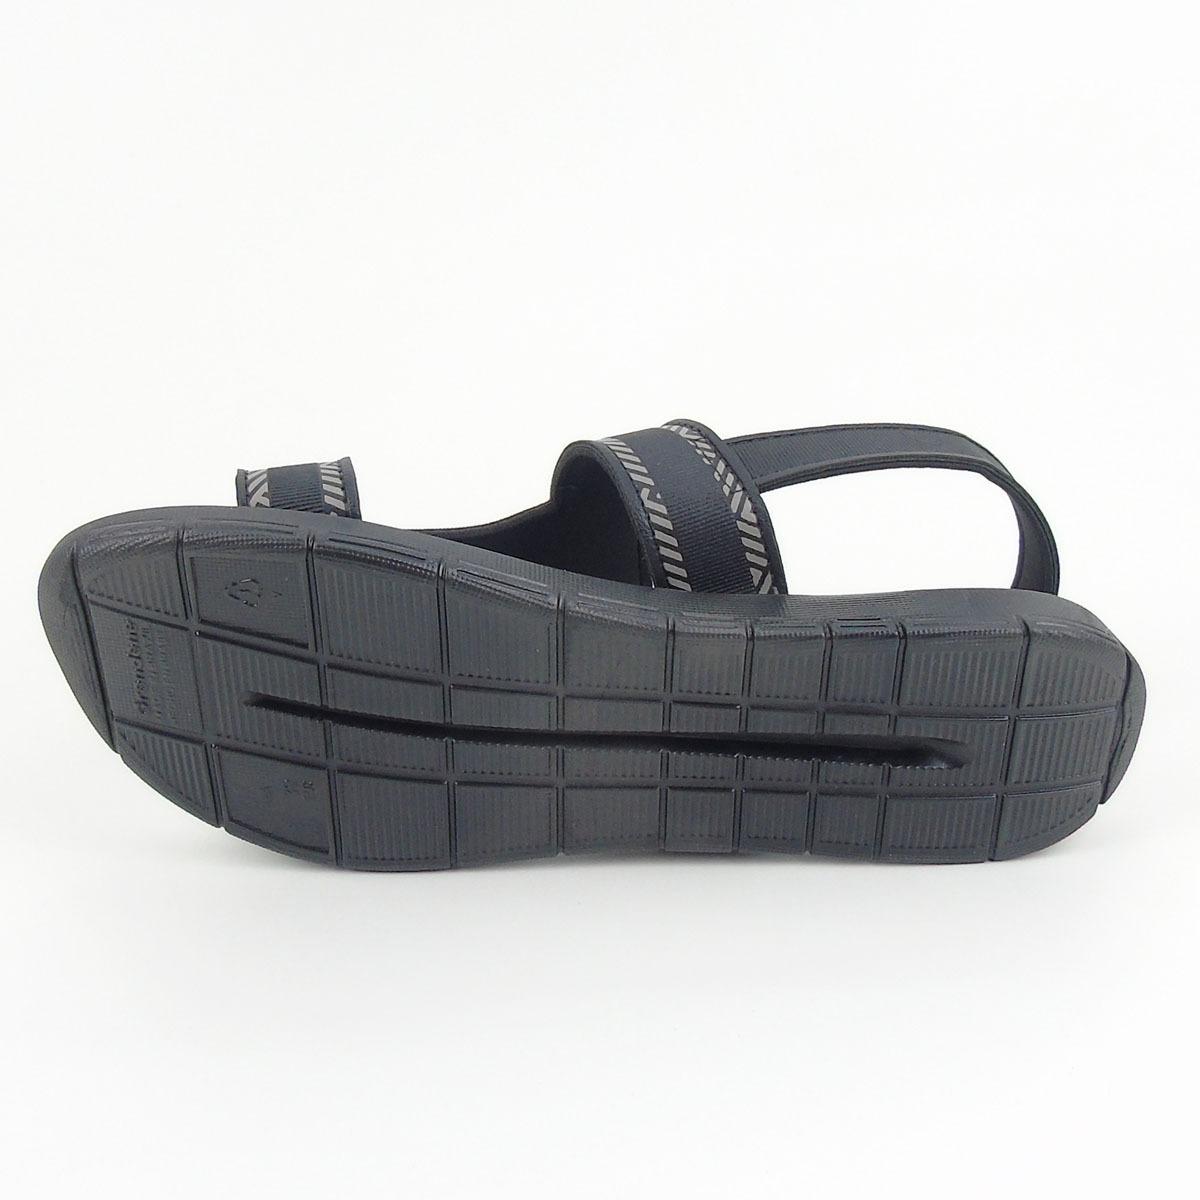 f179285d97 sandália rasteira grendha sense soft ii na cor prata. Carregando zoom.